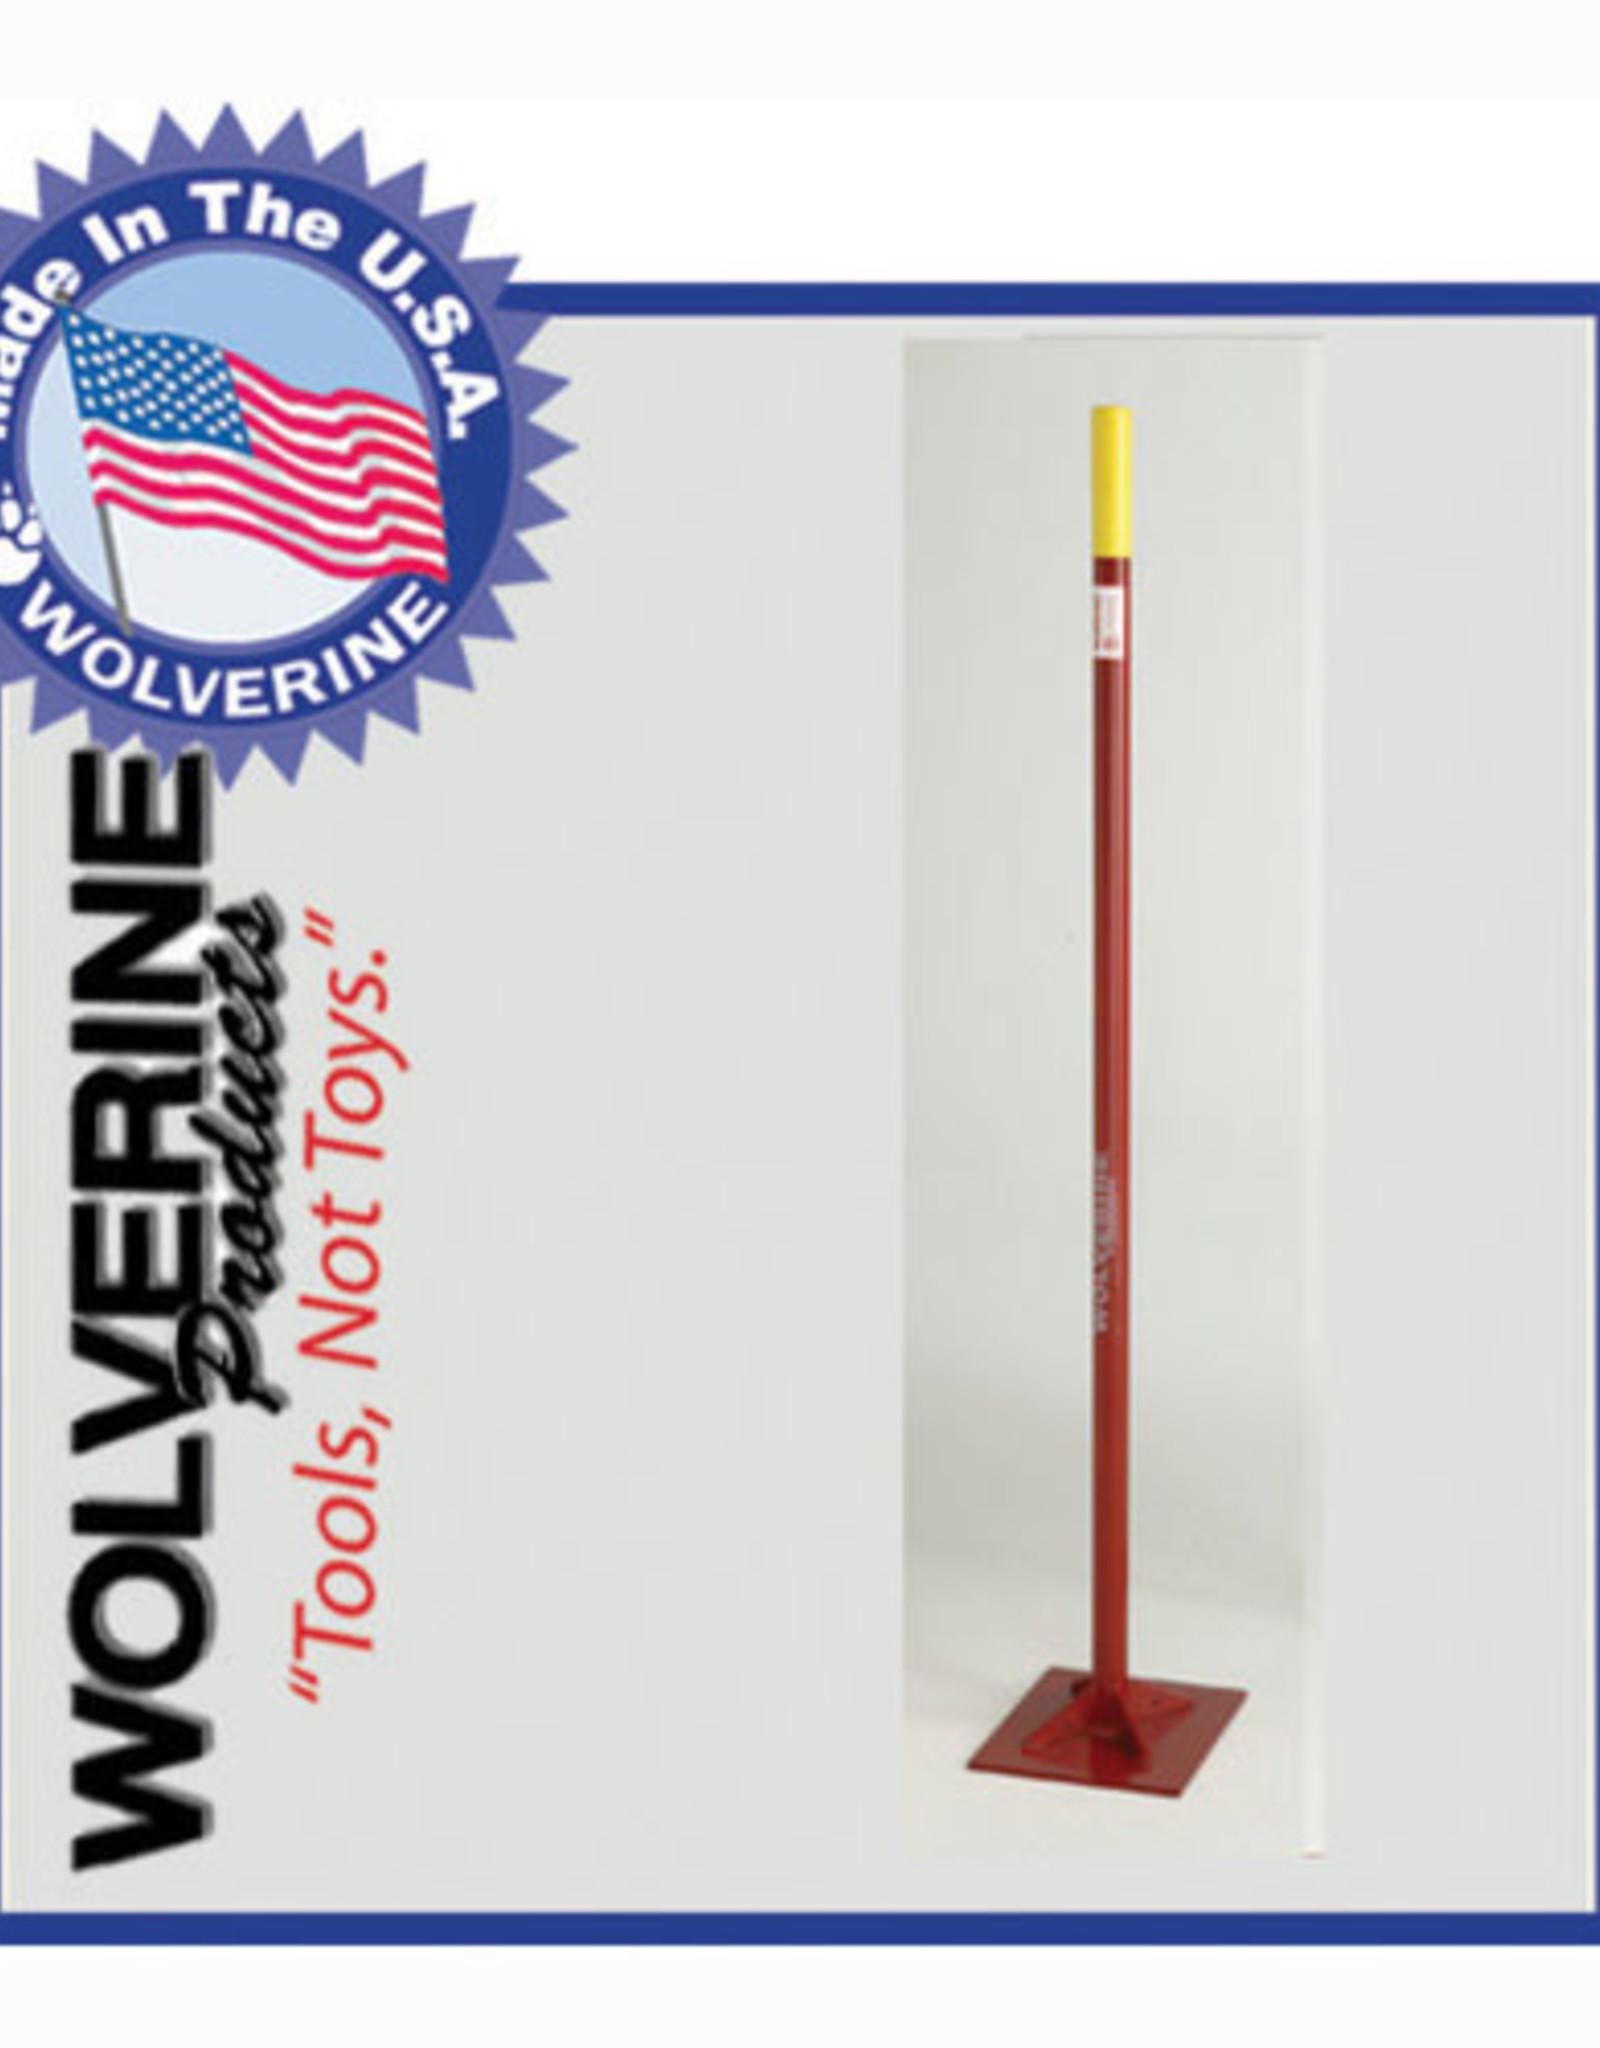 "Wolverine Wolverine Dirt Tamp 10""x10"" 54"" Steel Handle S1010T"